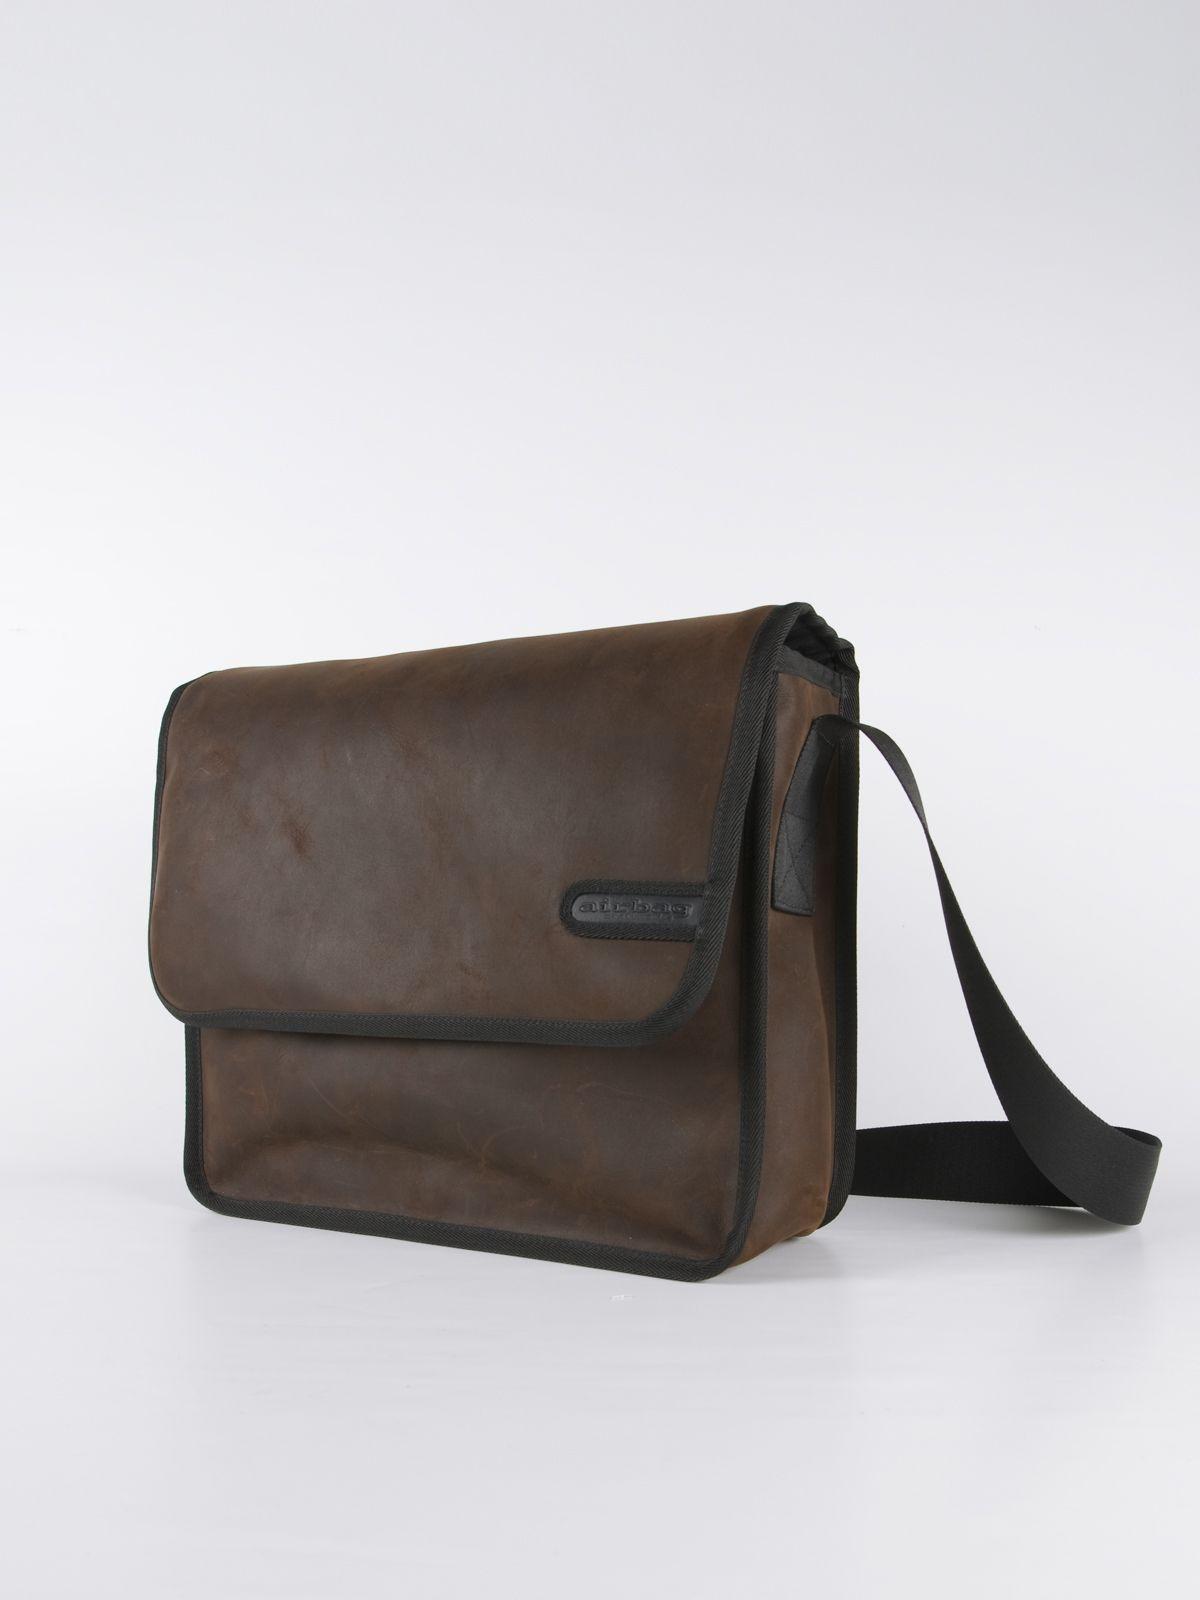 airbag craftworks DLX brown